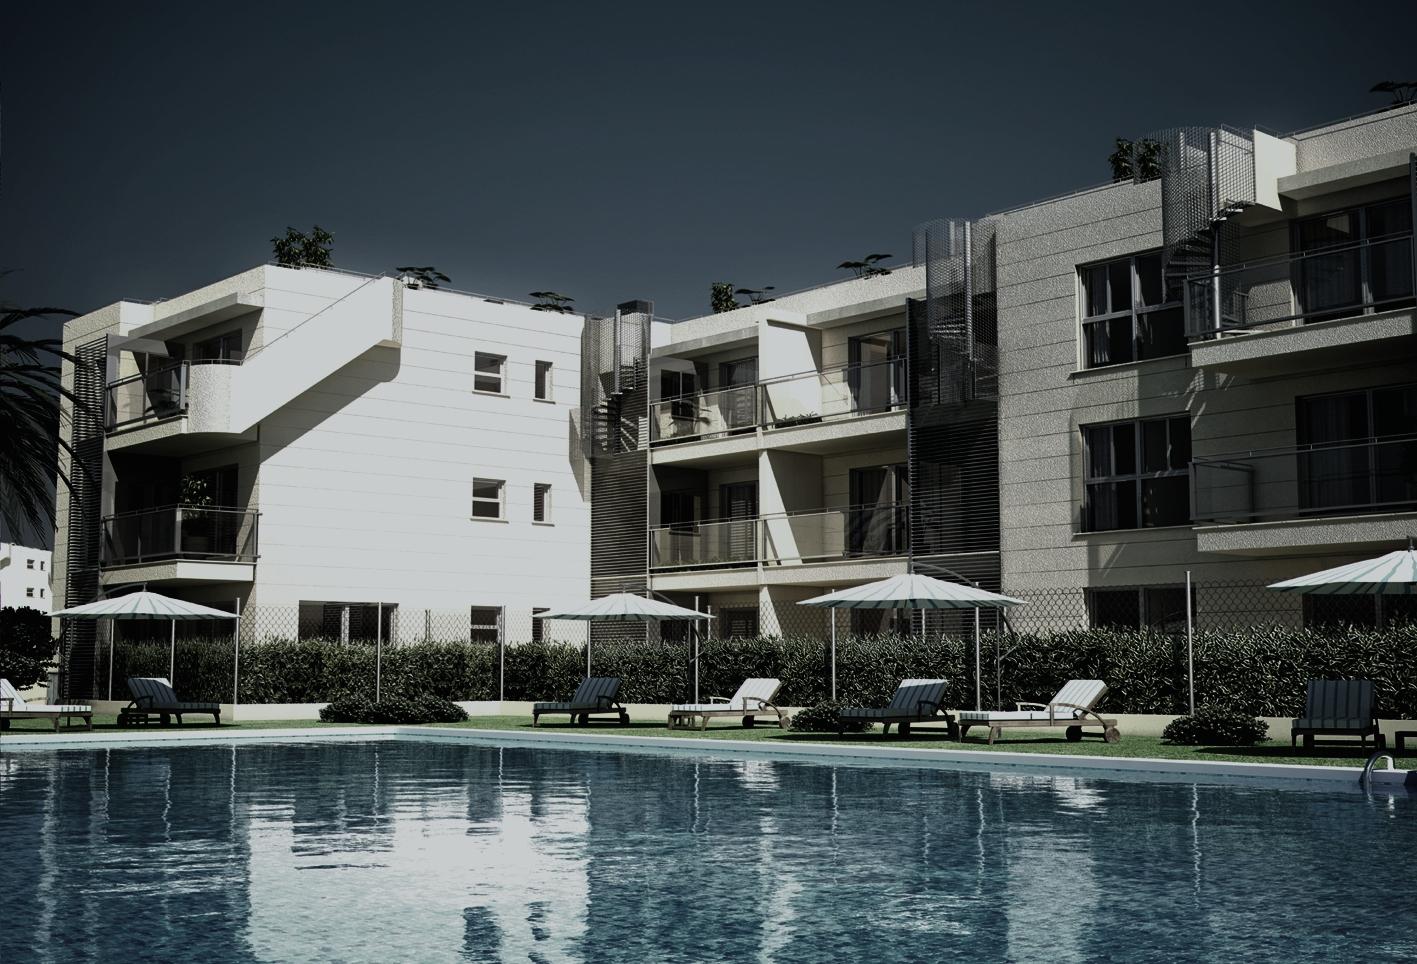 Ortol arquitectos estudio de arquitectura en valencia y - Arquitectos en valencia ...